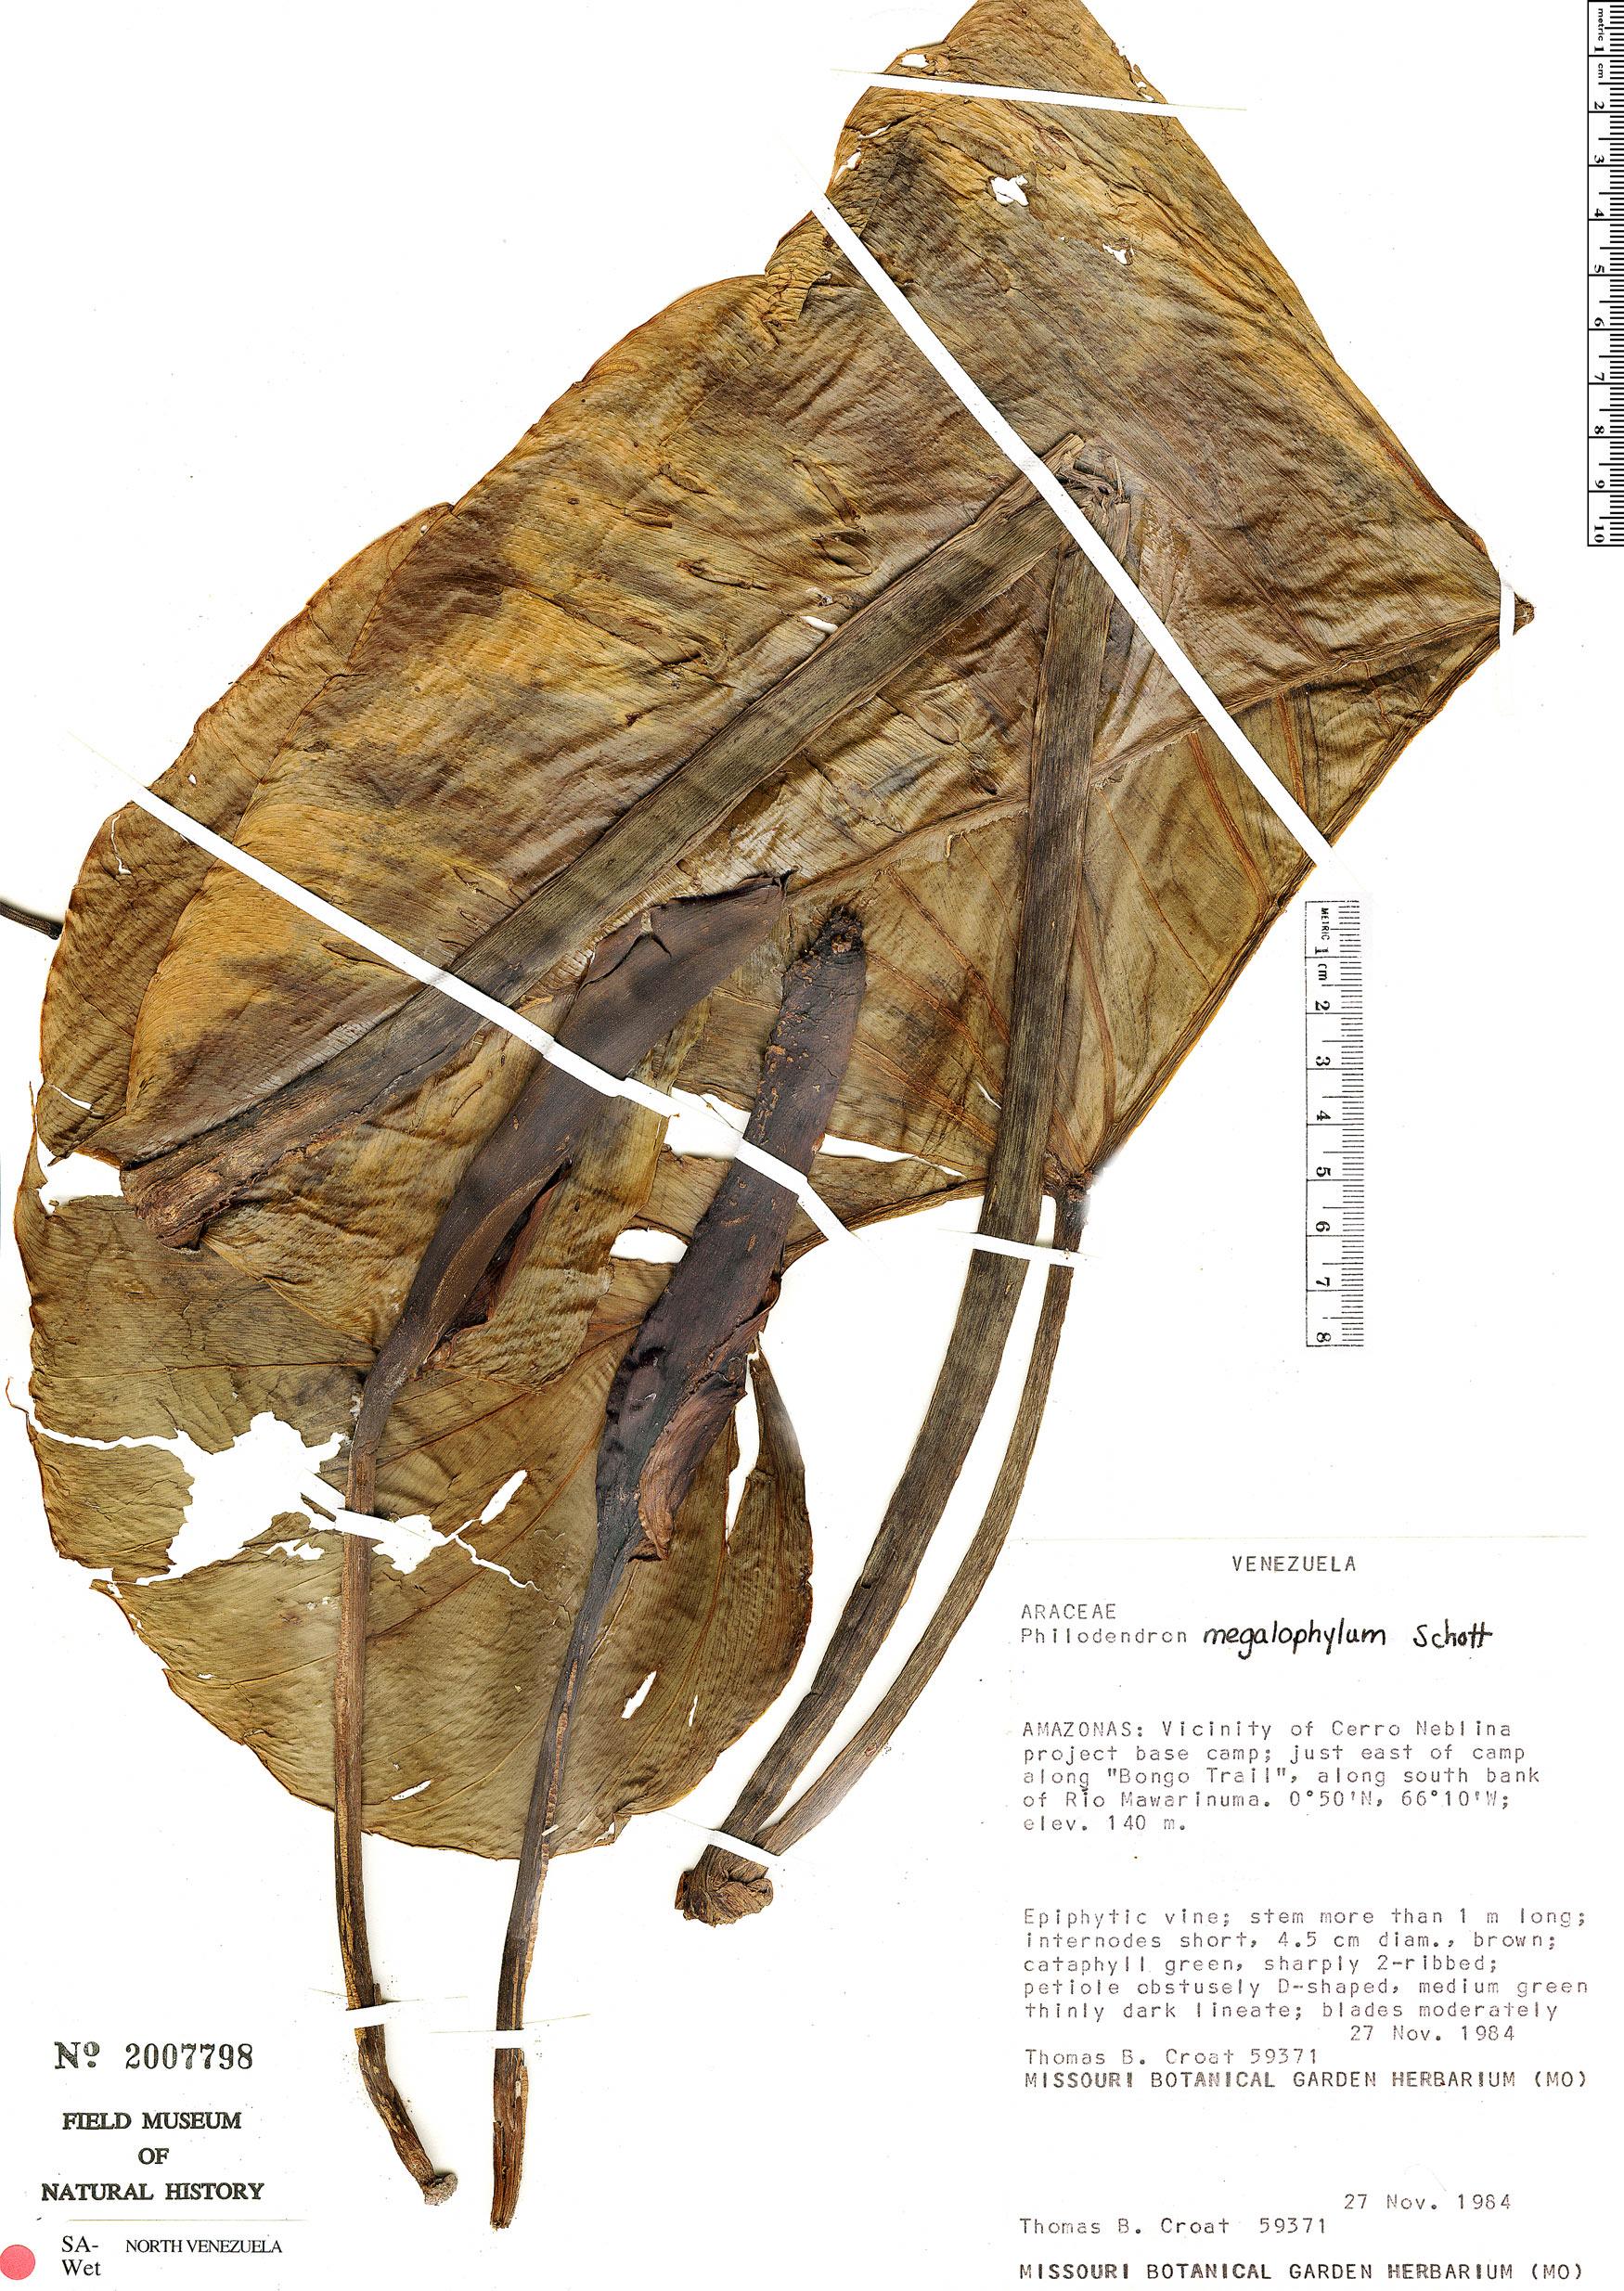 Specimen: Philodendron megalophyllum